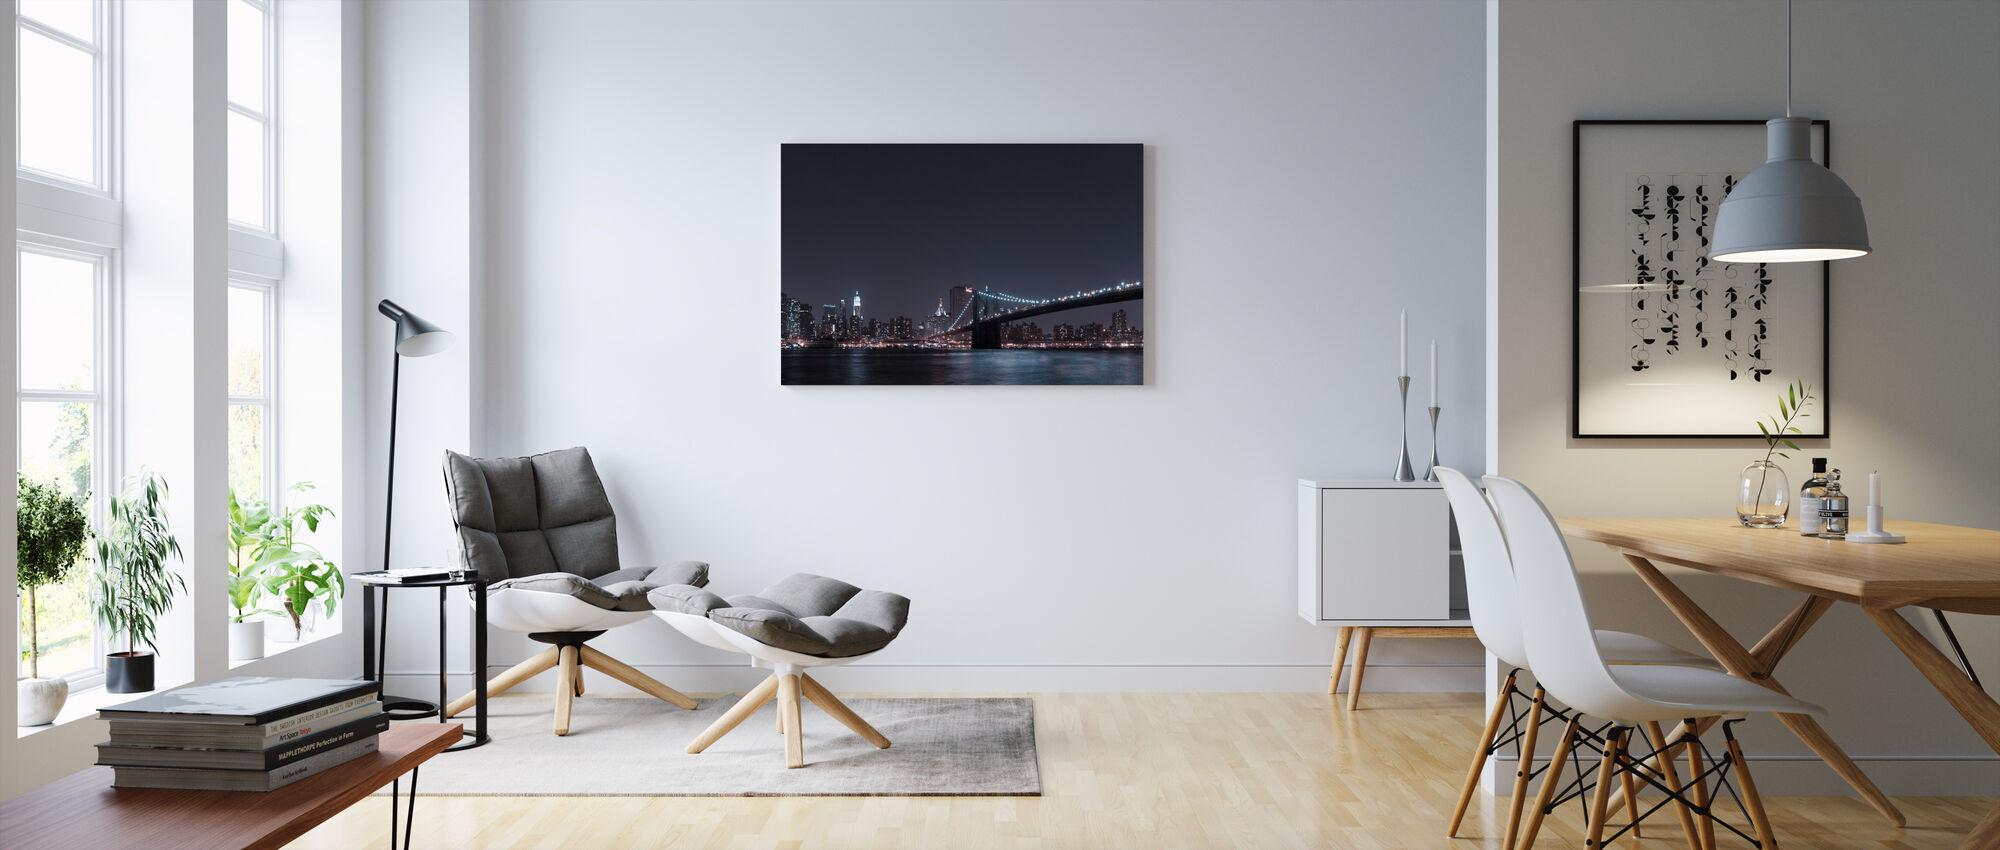 Manhattan Skyline og Brooklyn Bridge - Billede på lærred - Stue